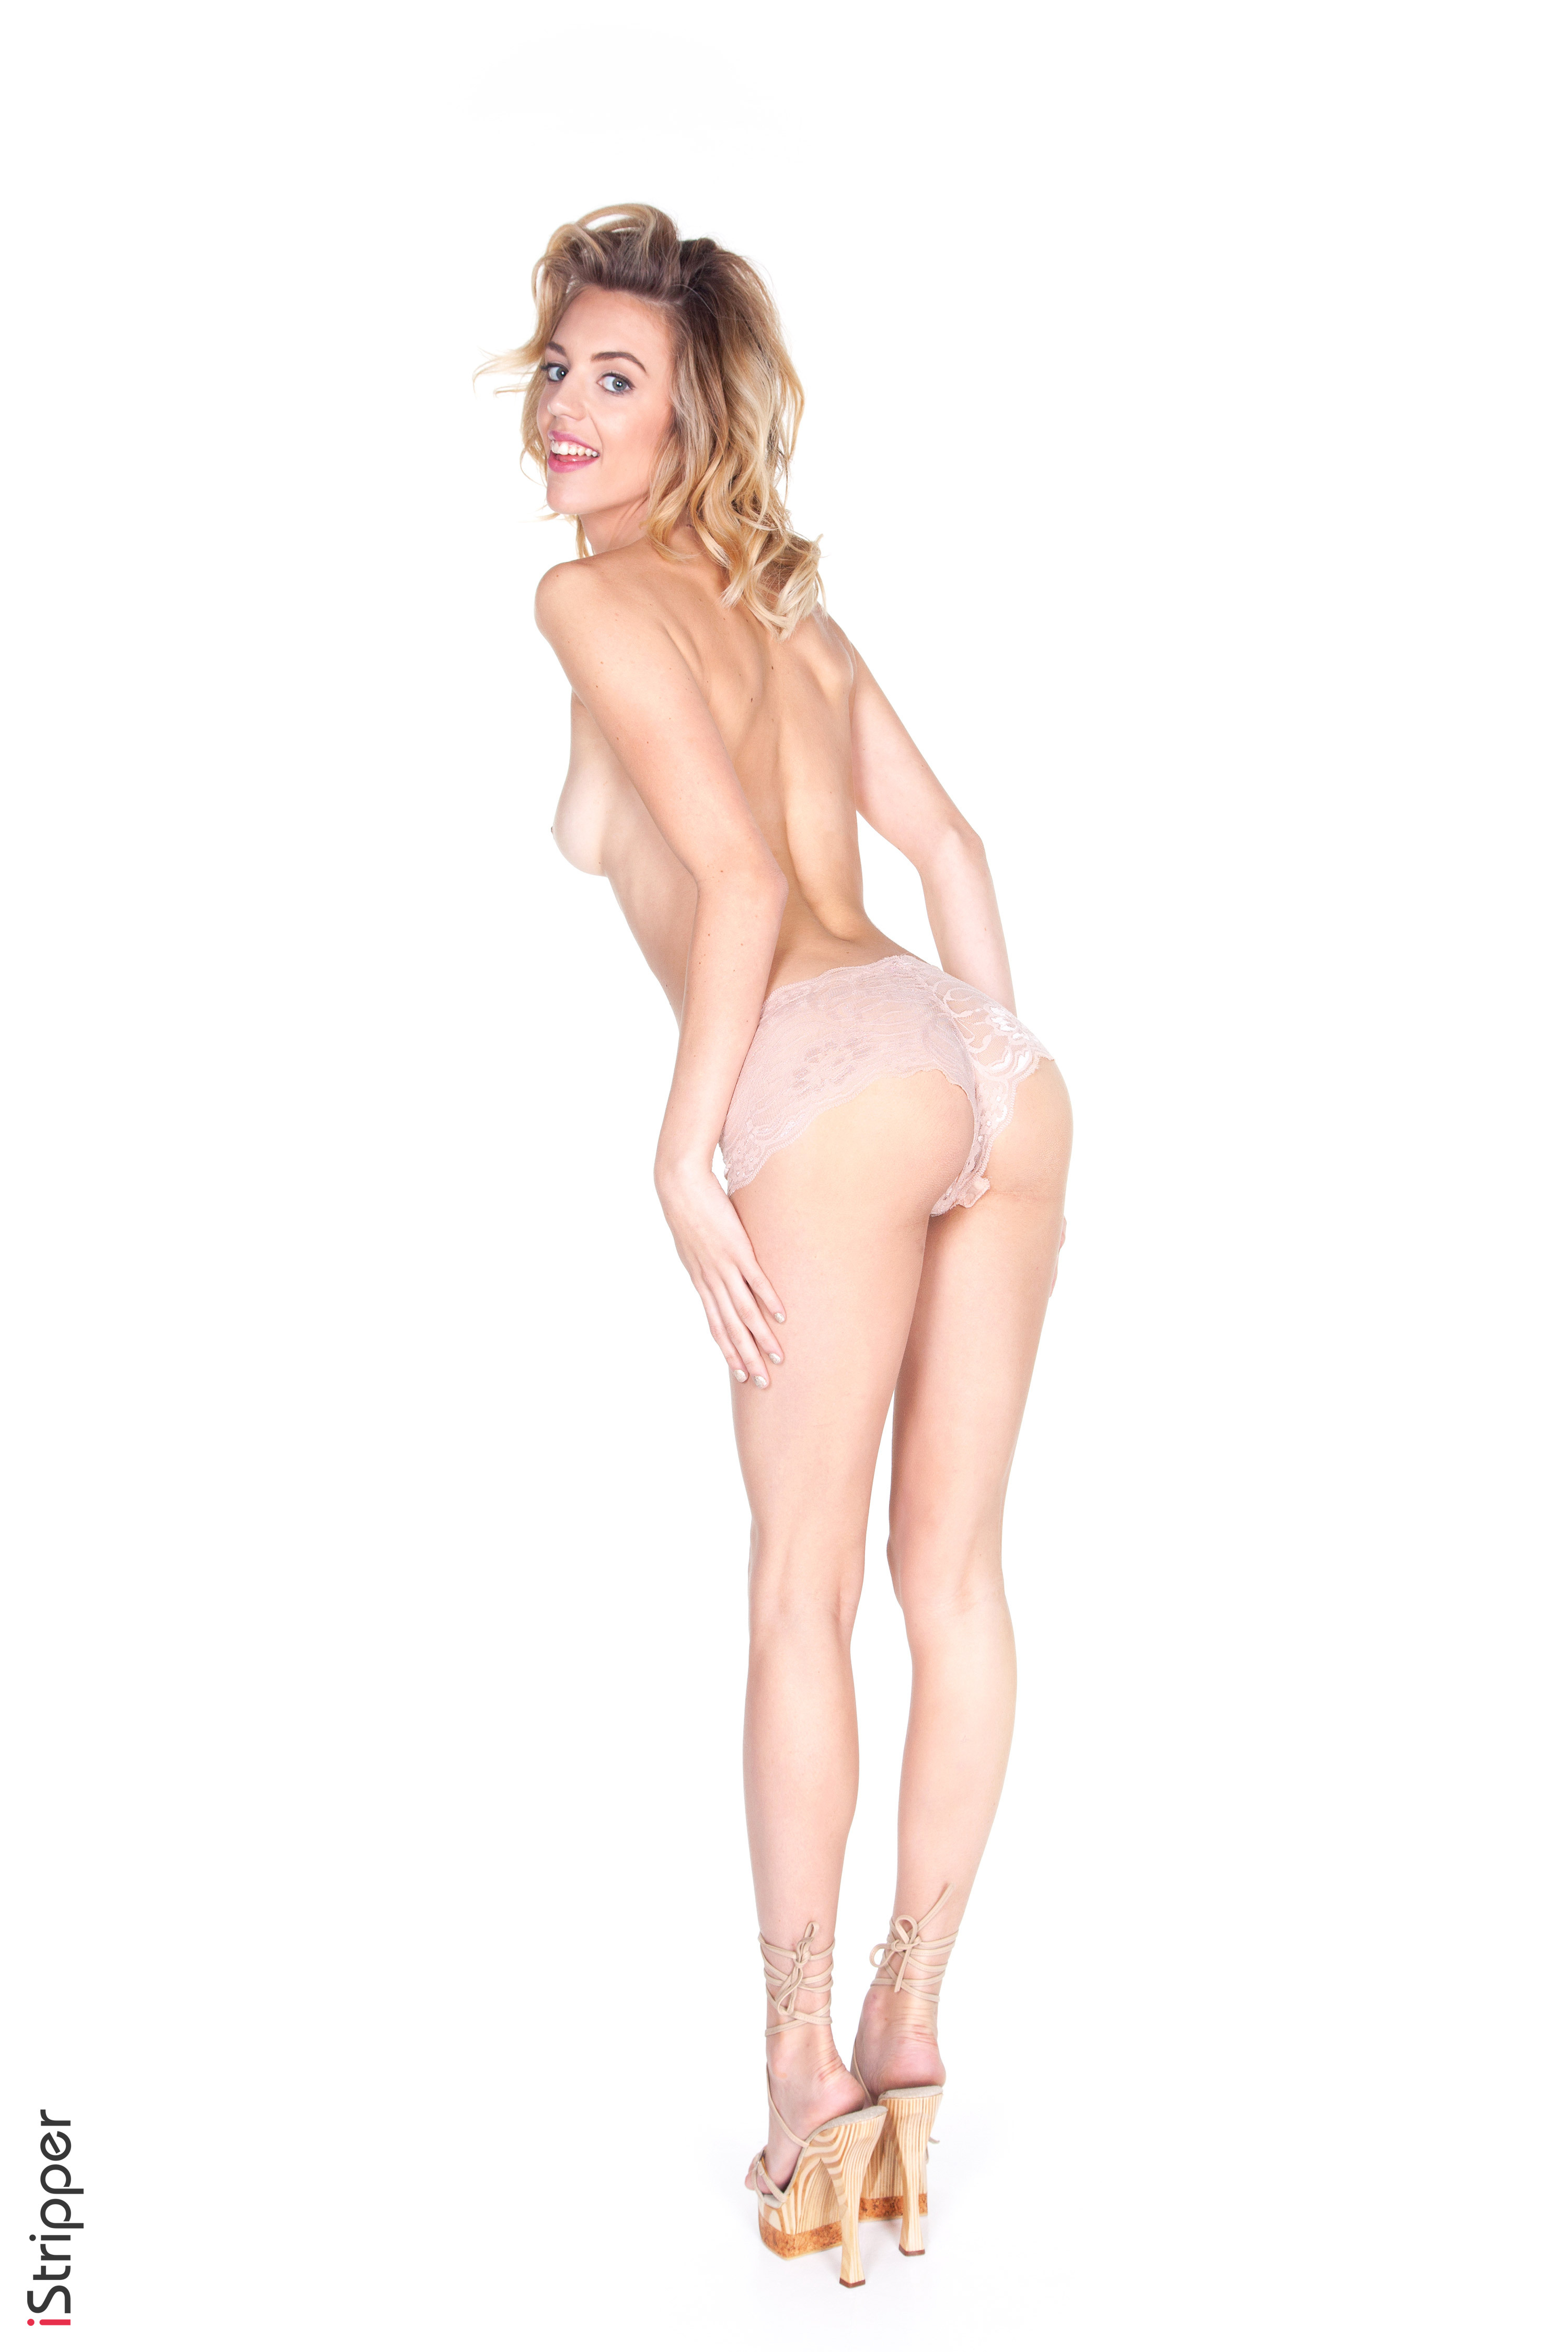 nude live wallpaper